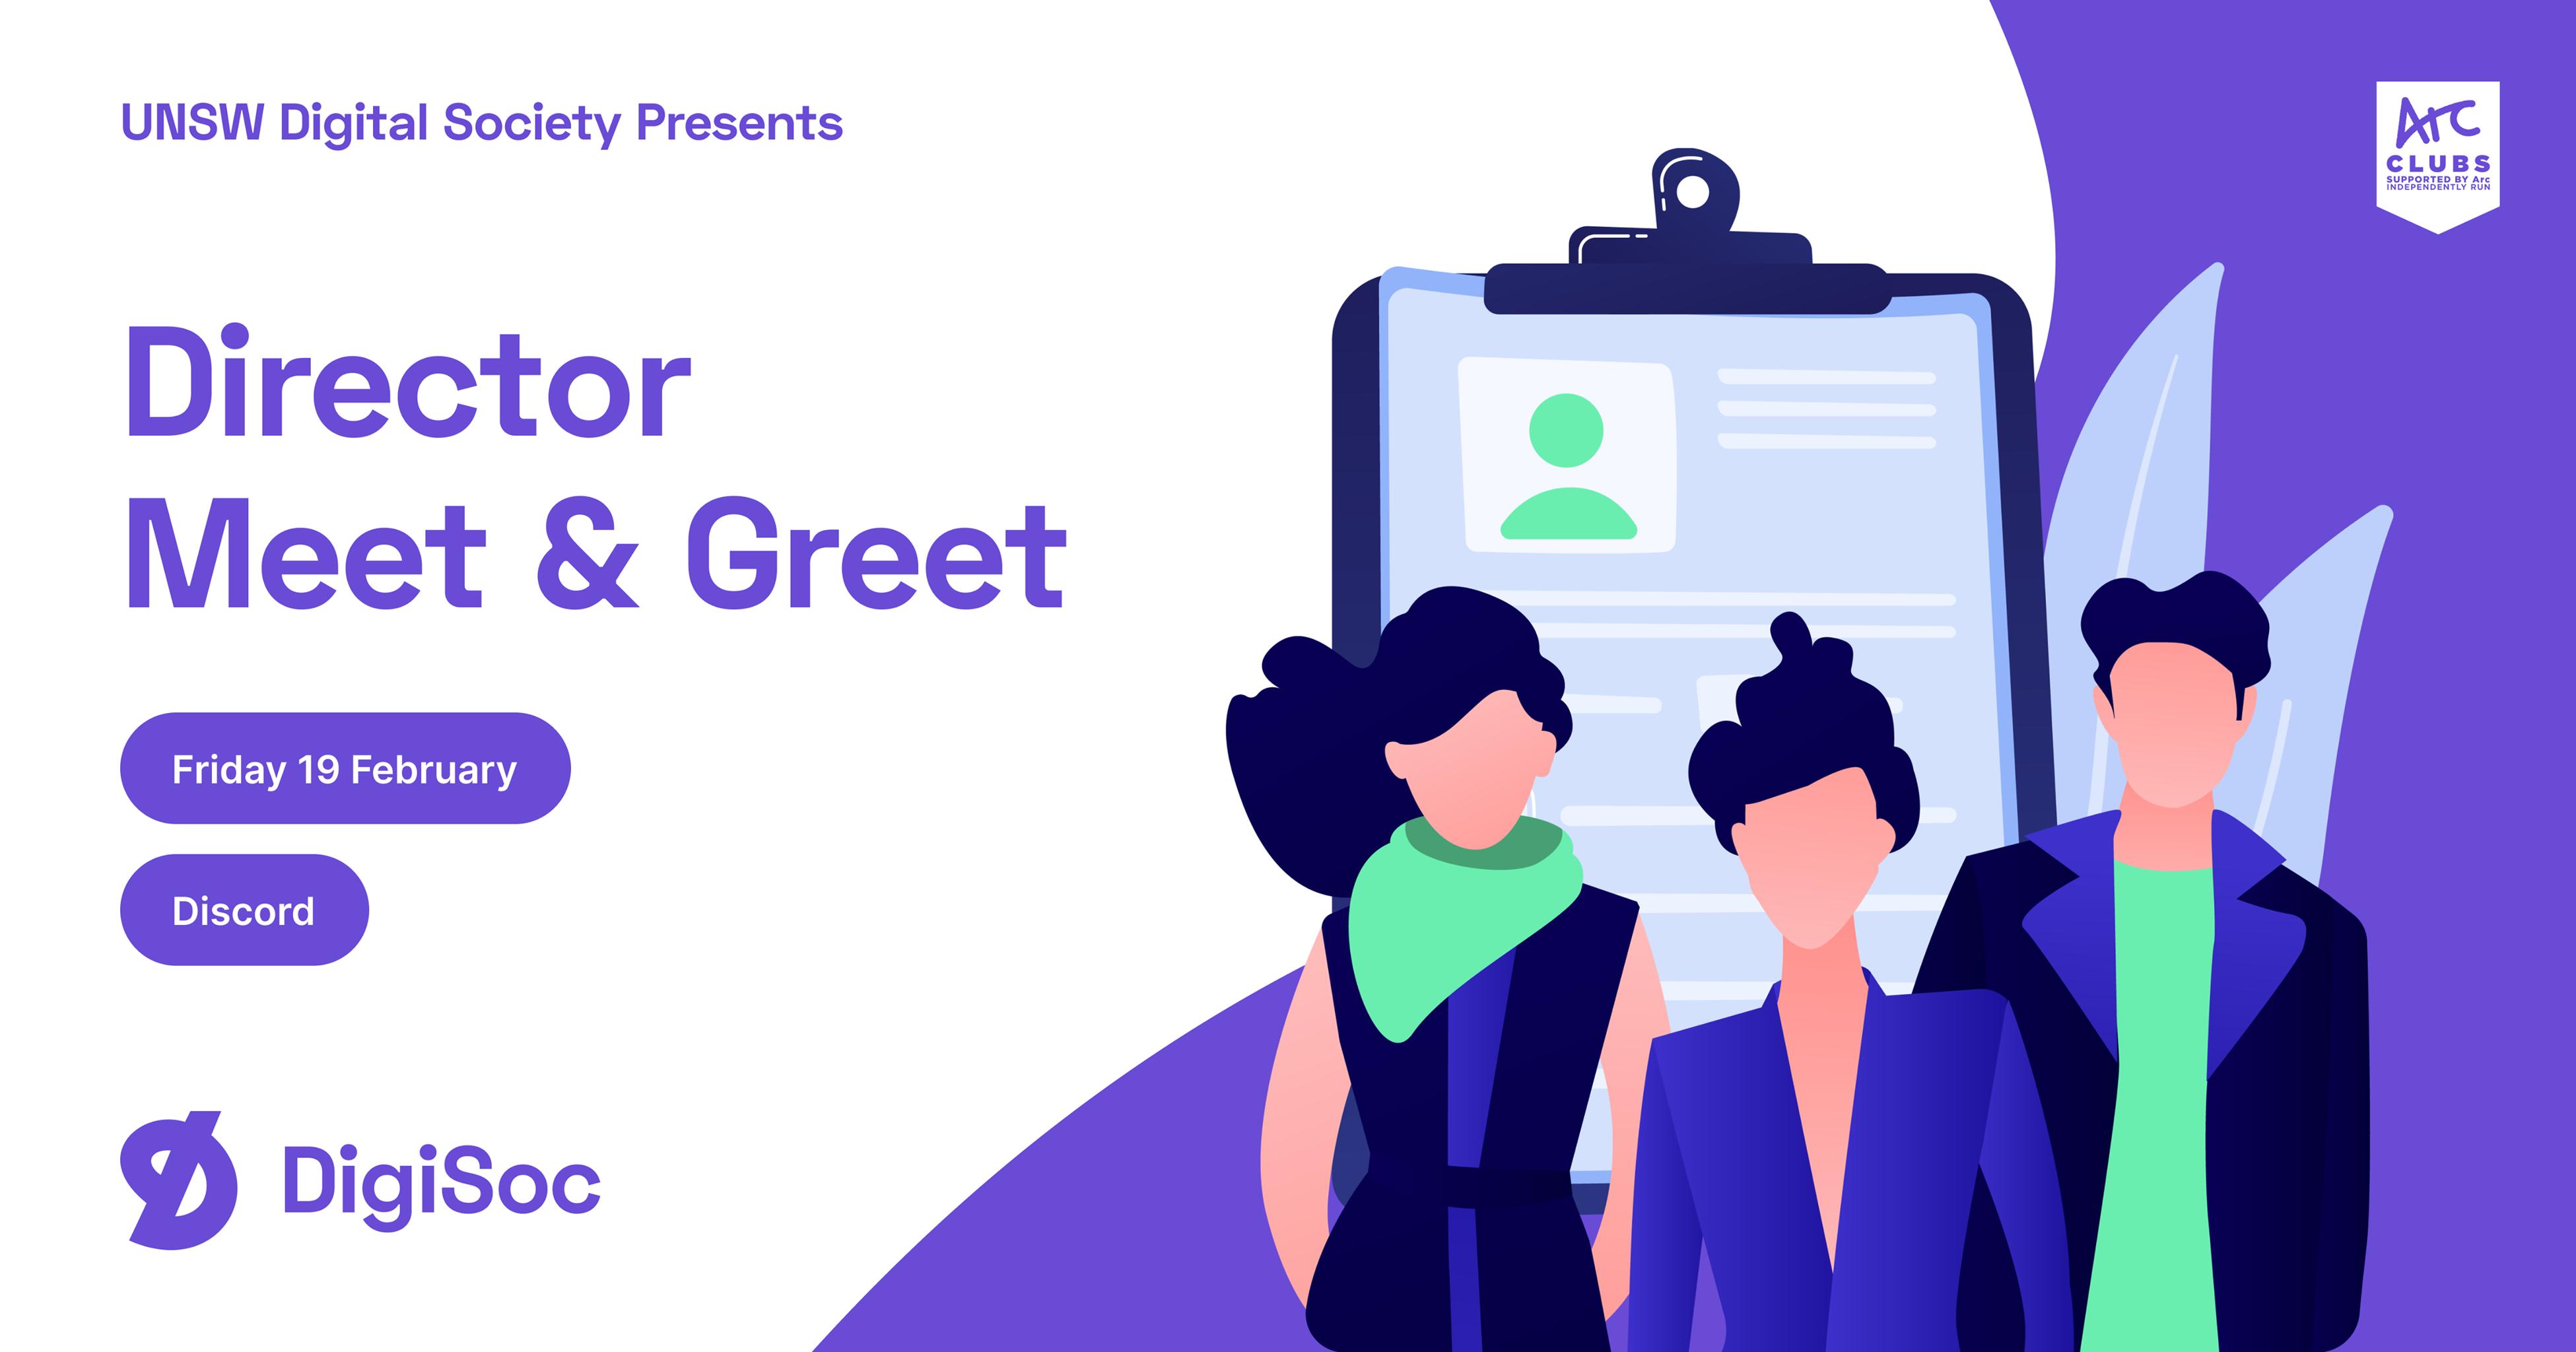 DigiSoc Presents: Director Meet & Greet